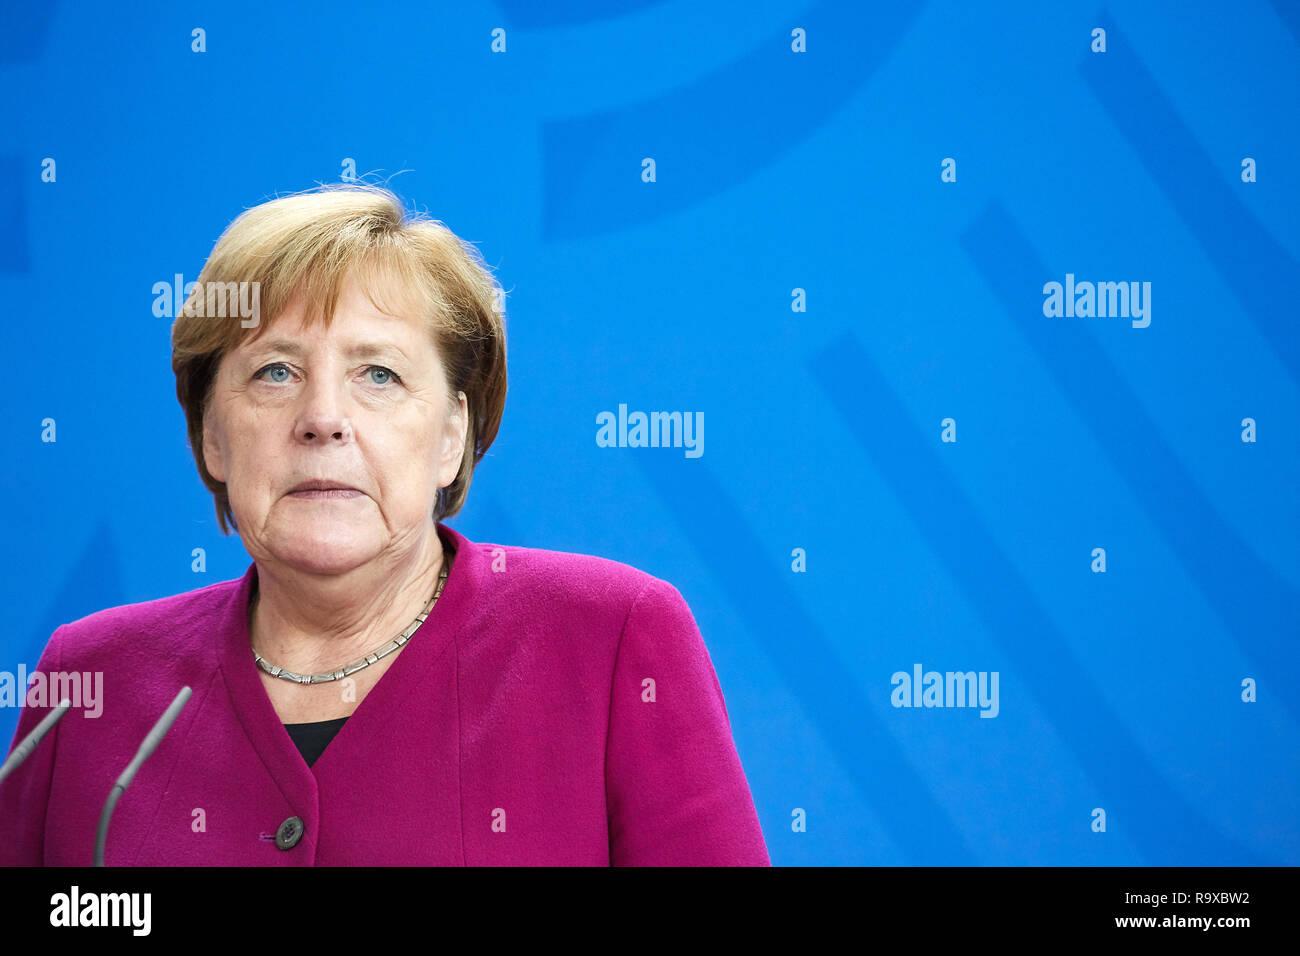 16.10.2018, Berlin, Deutschland - Bundeskanzlerin Angela Merkel. 00R181016D112CARO.JPG [MODEL RELEASE: NO, PROPERTY RELEASE: NO (c) caro images / Thom Stock Photo